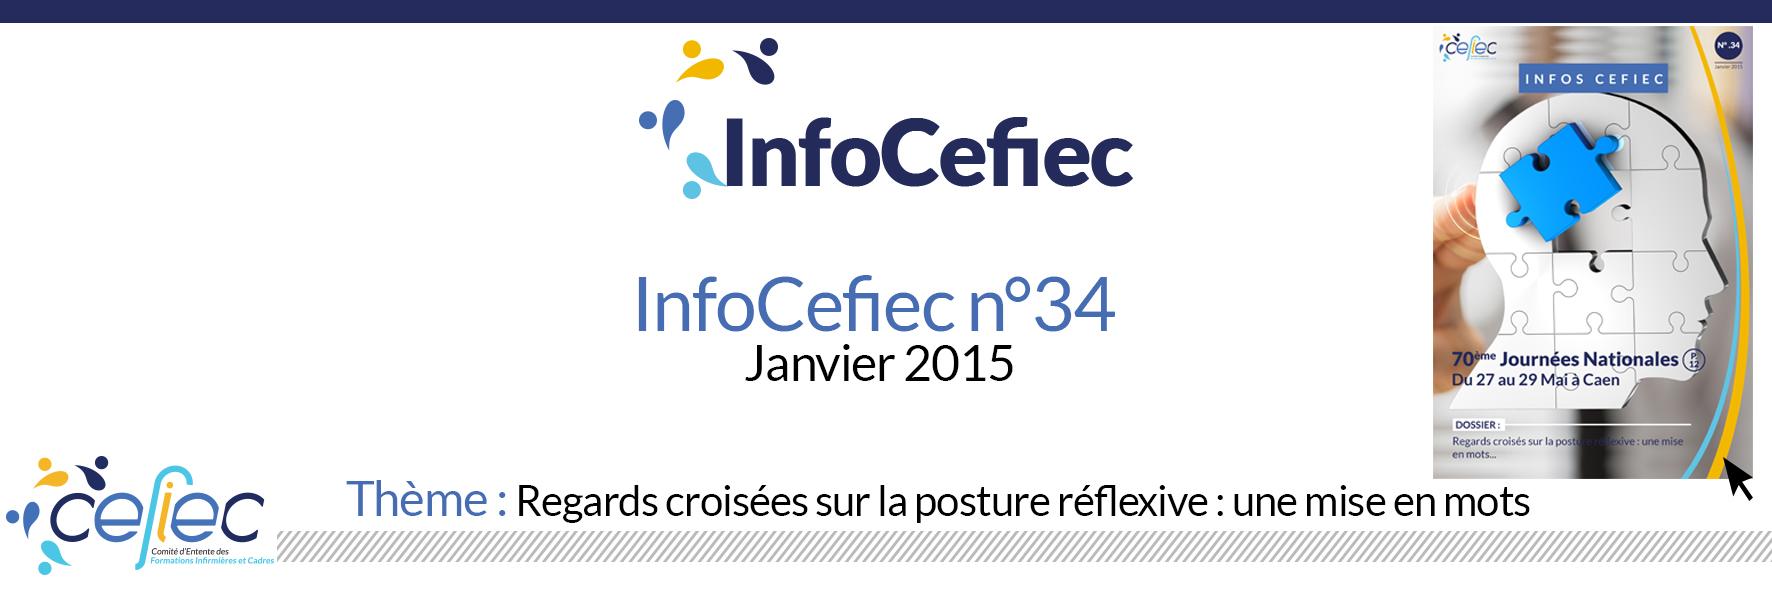 InfoCefiec n°34